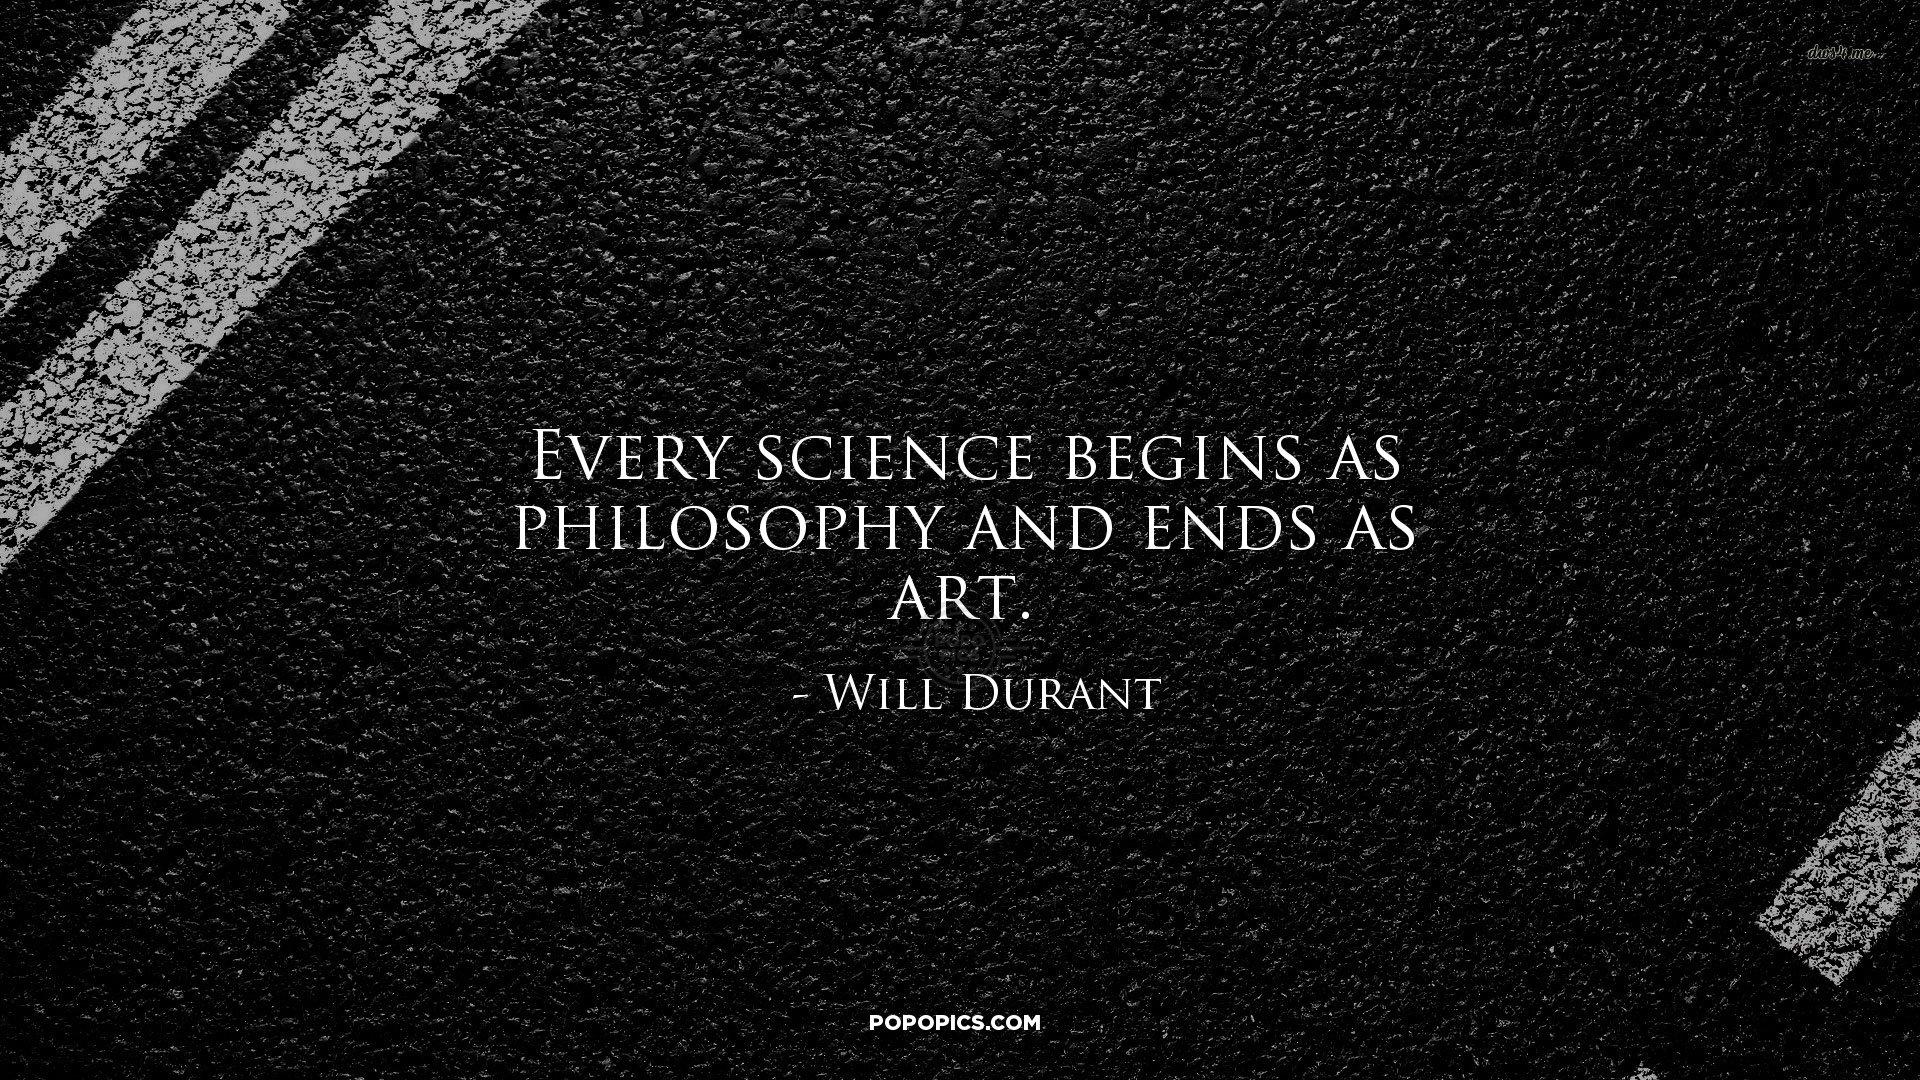 Resultado de imagen para every science begins as philosophy and ends as an art